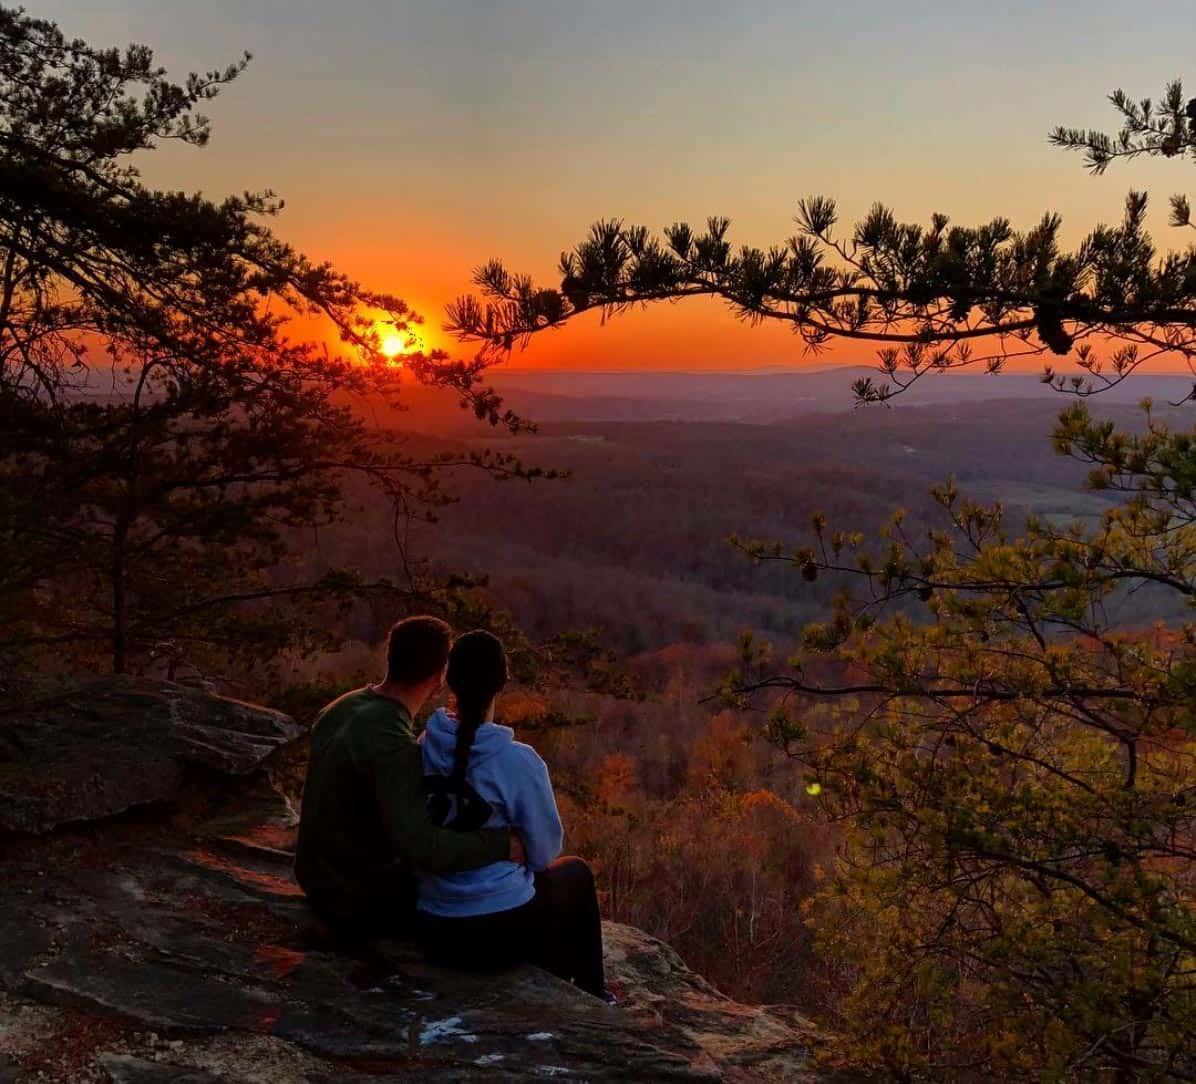 sunset rock via bluff trail